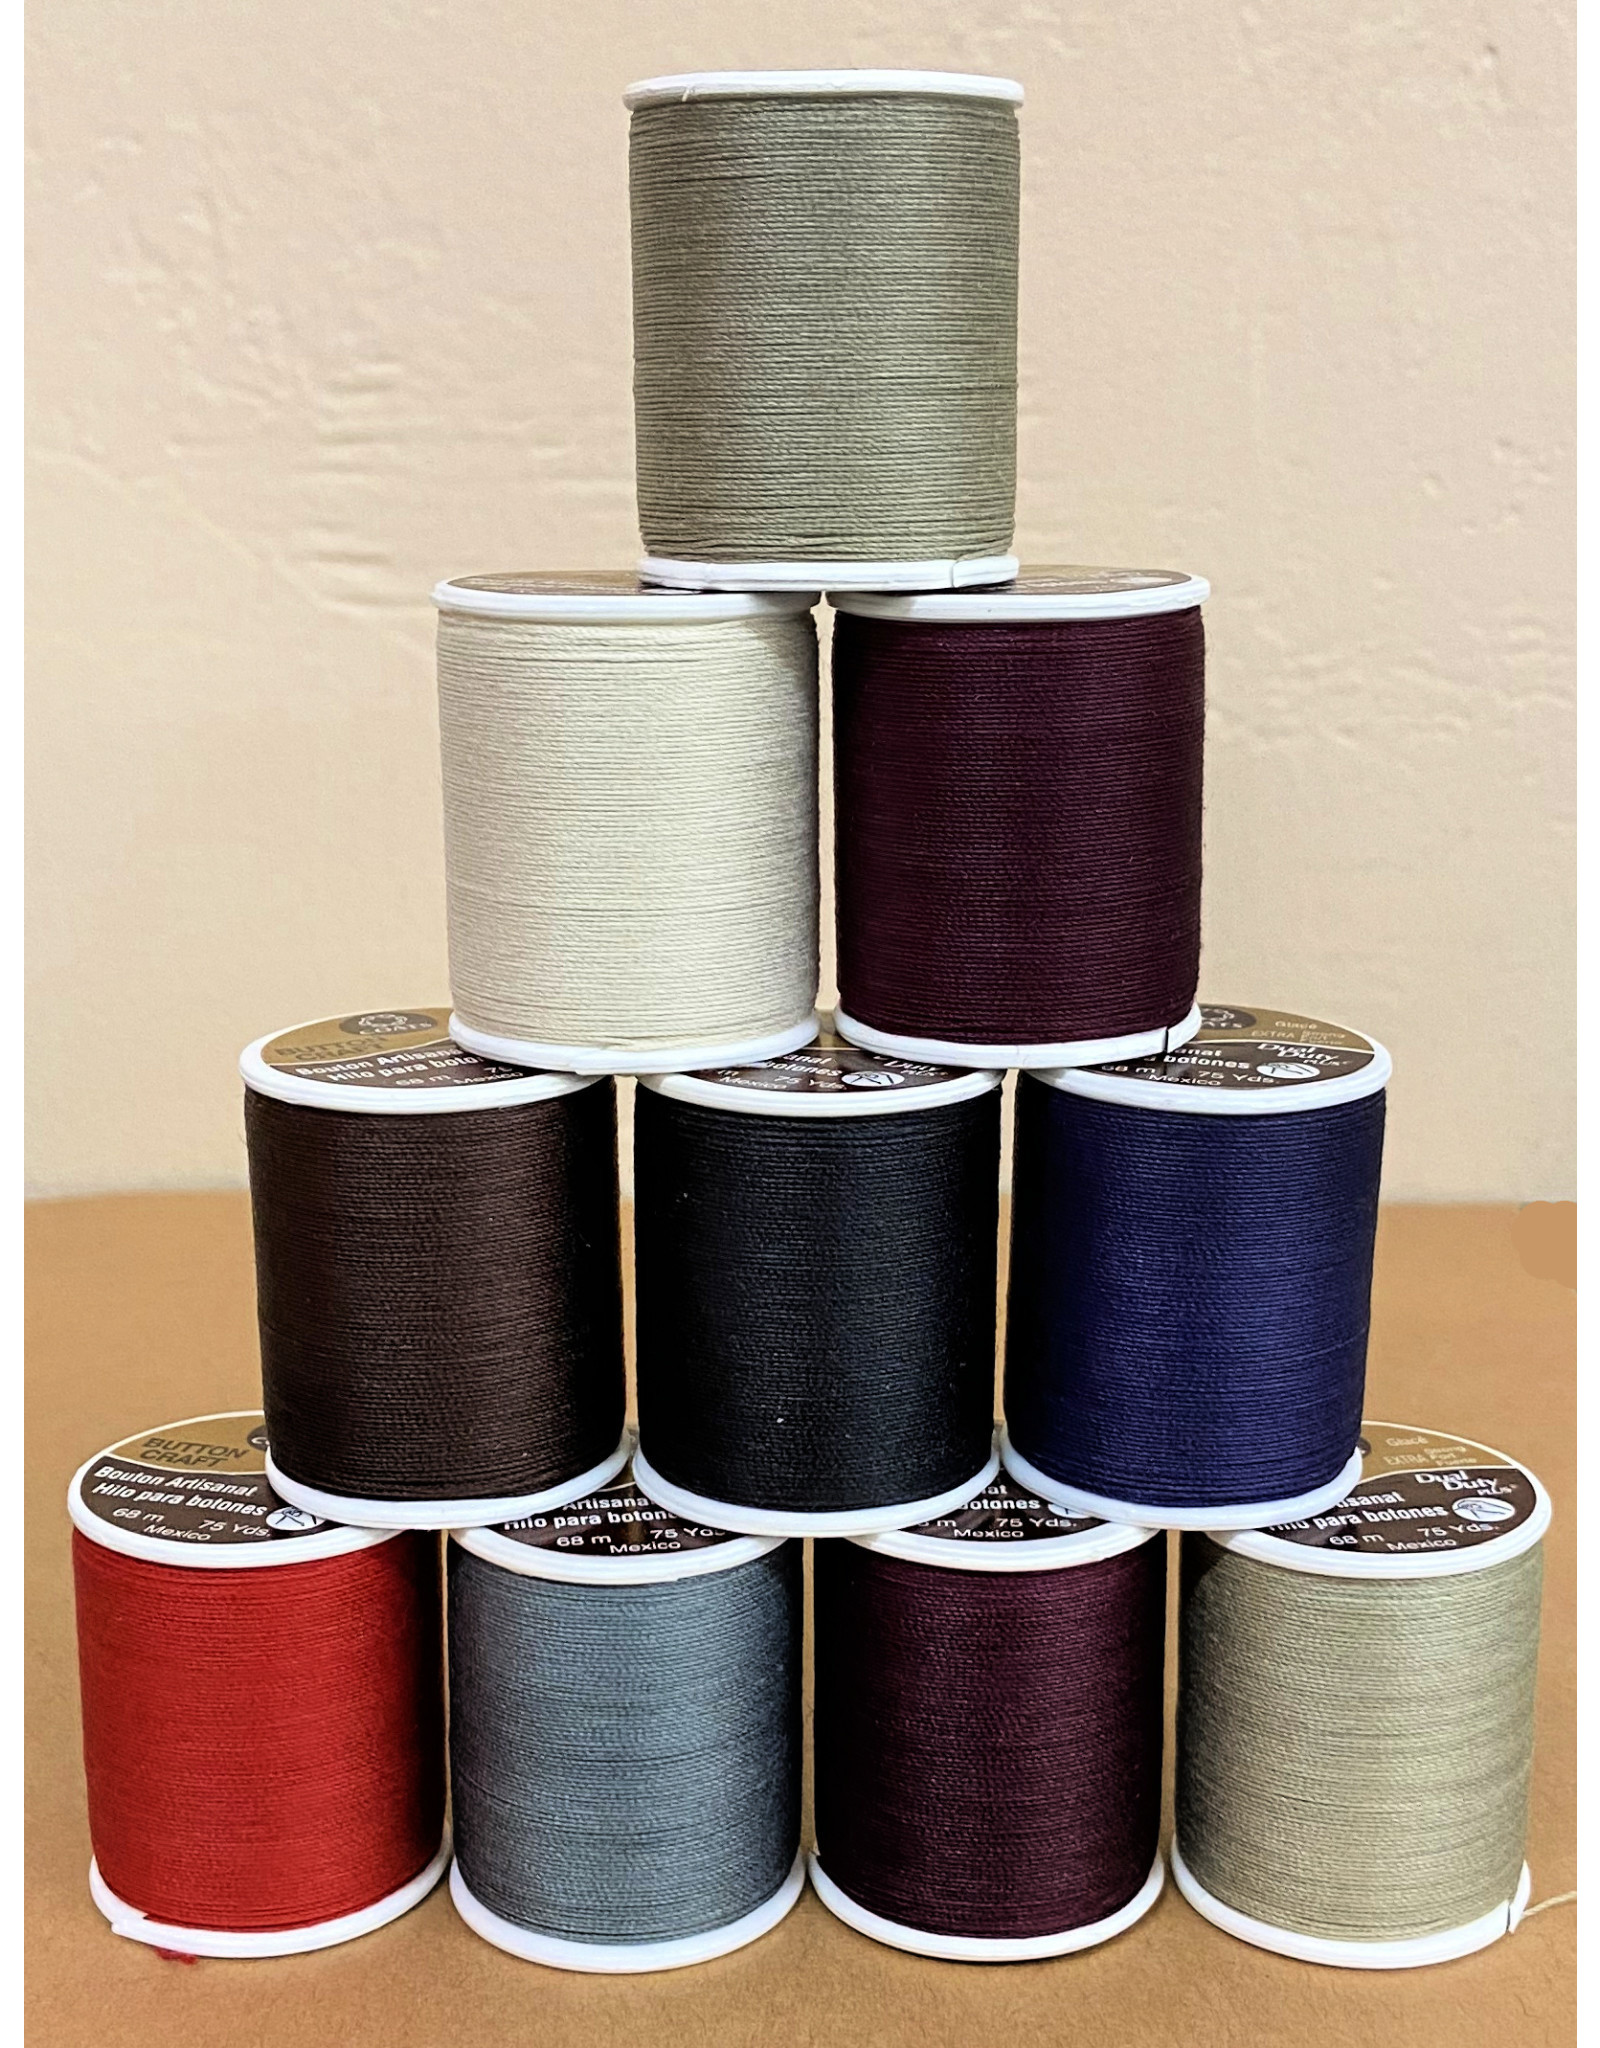 Coats & Clark Button Craft Thread, Dual Duty Plus, Color: Slate